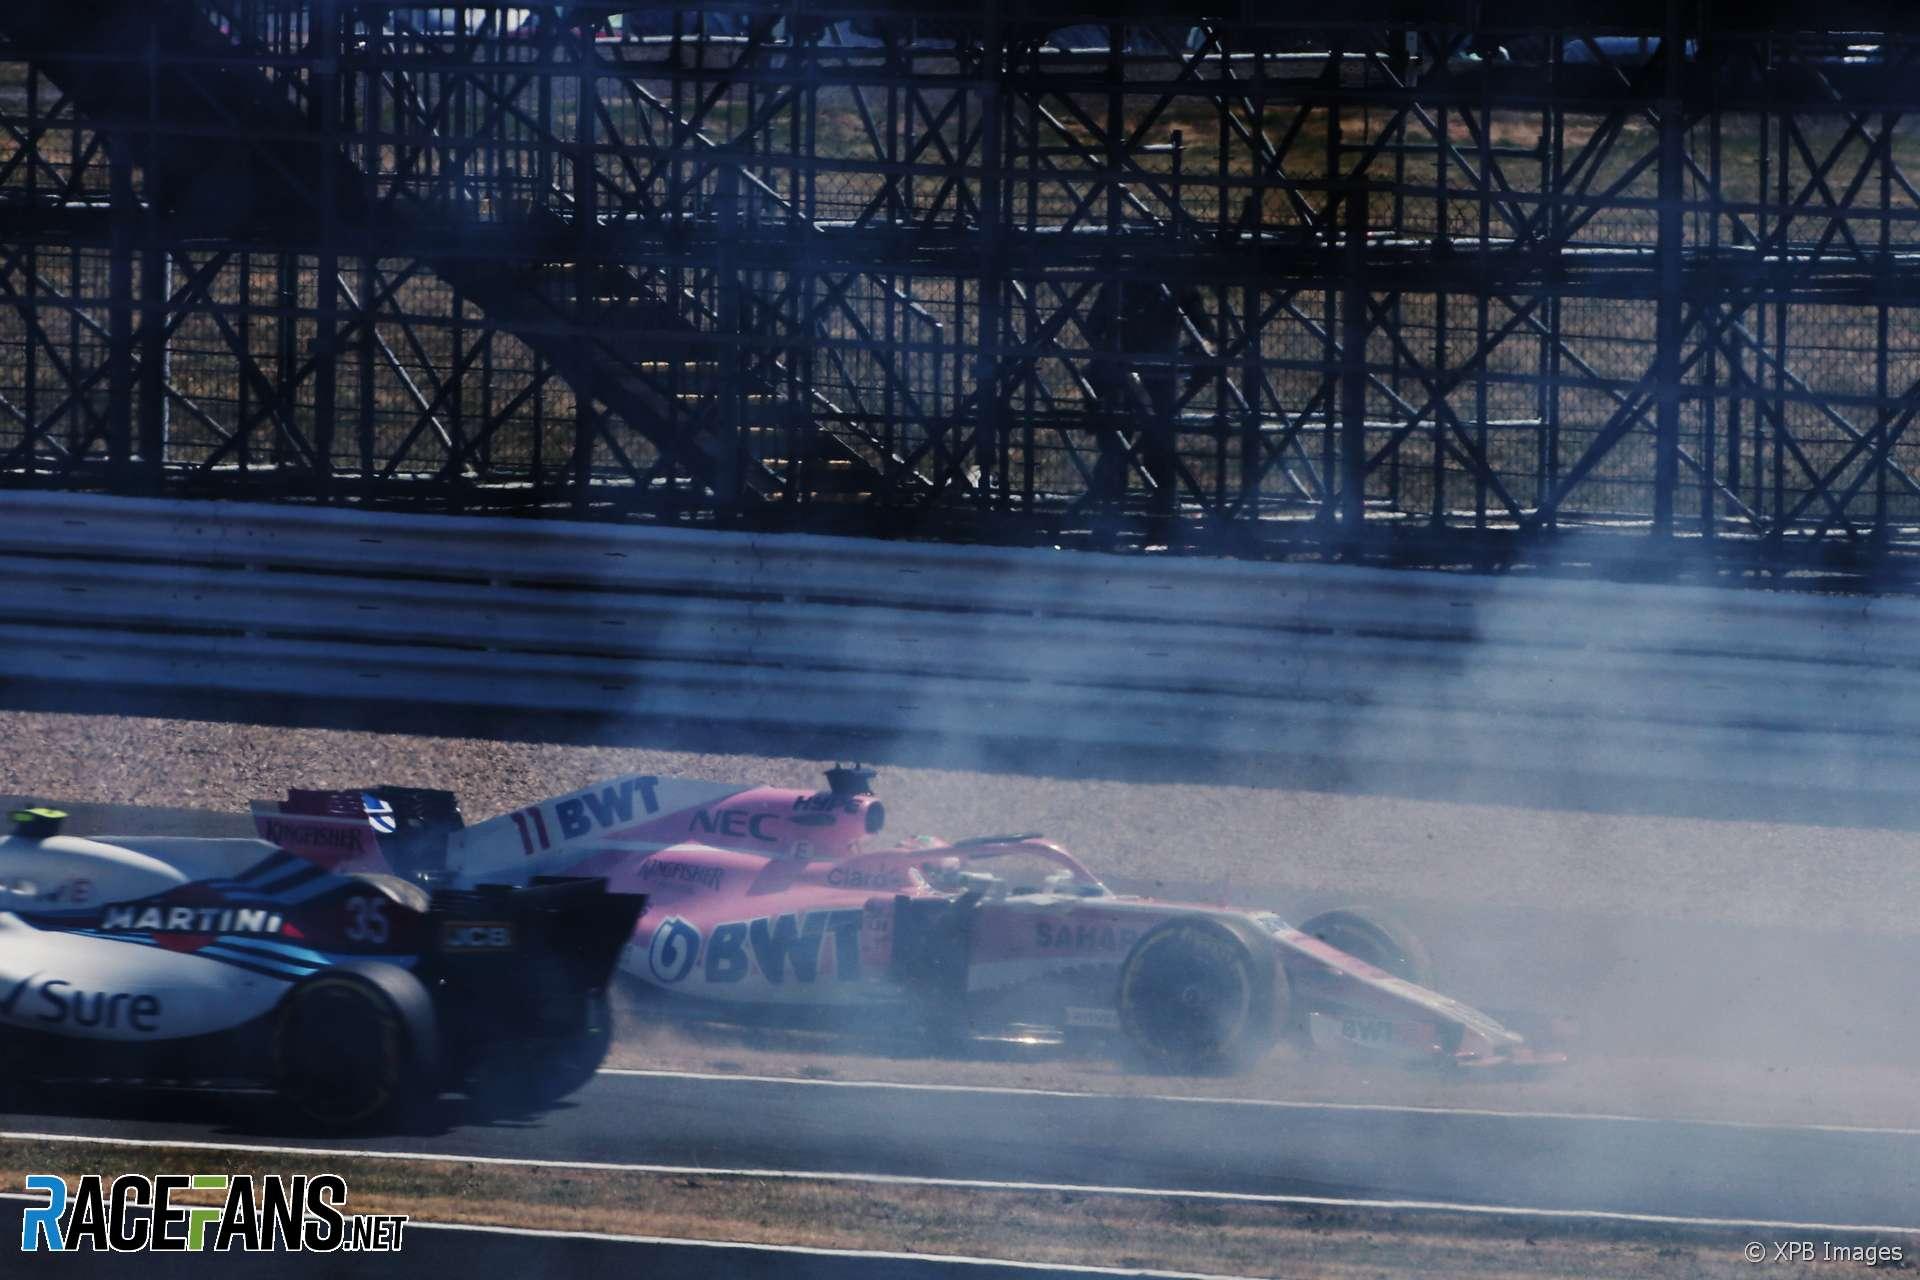 Sergio Perez, Force India, Silverstone, 2018